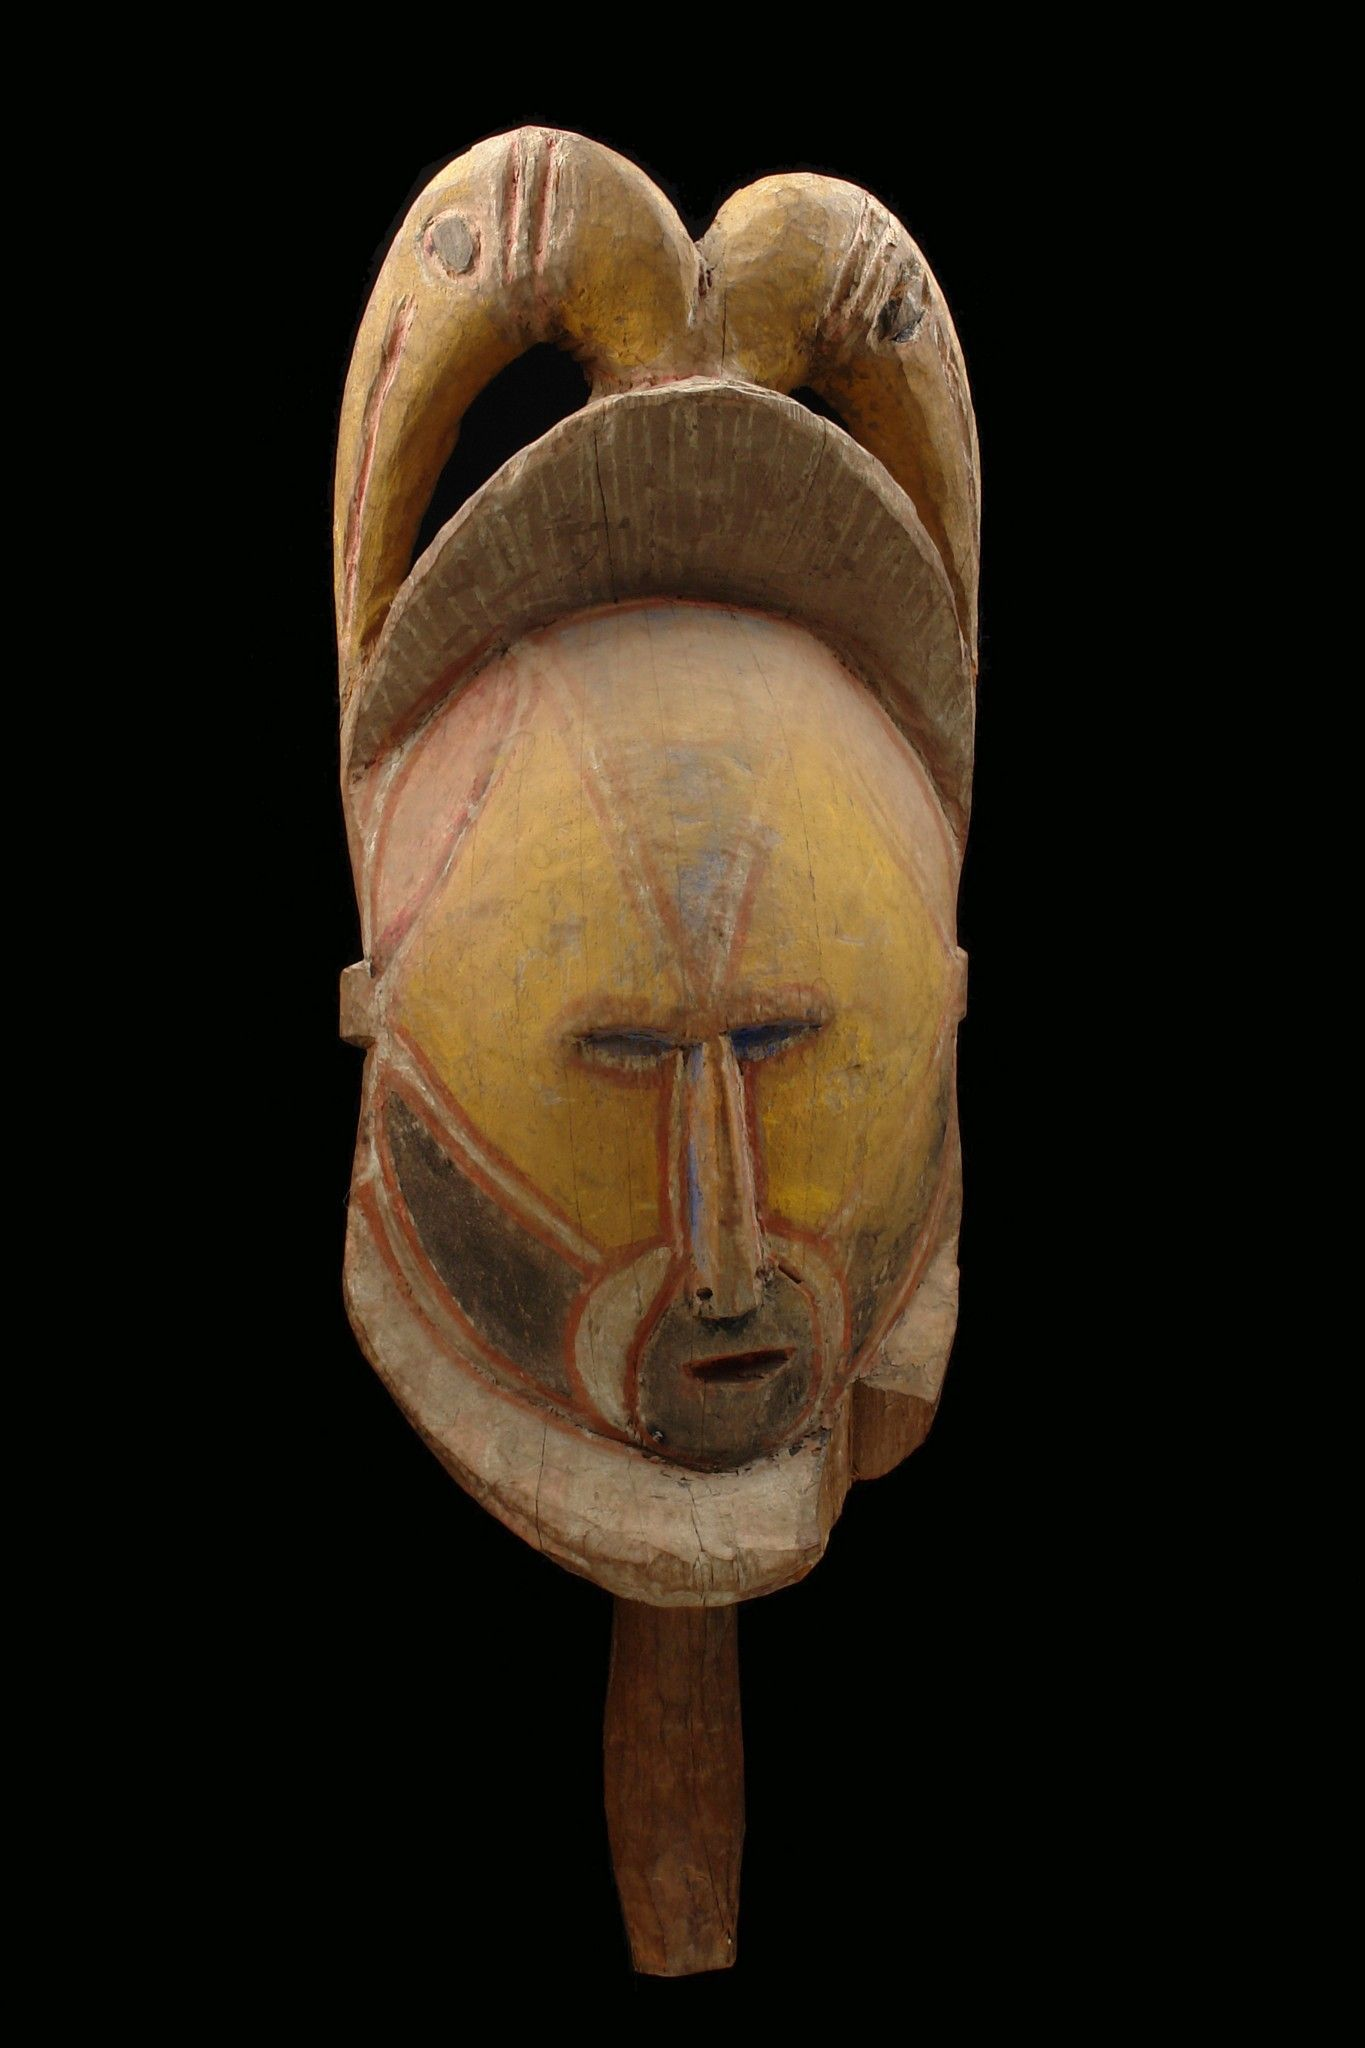 Portrait of a spirits head Papua New Guinea - Maprik 26 inches